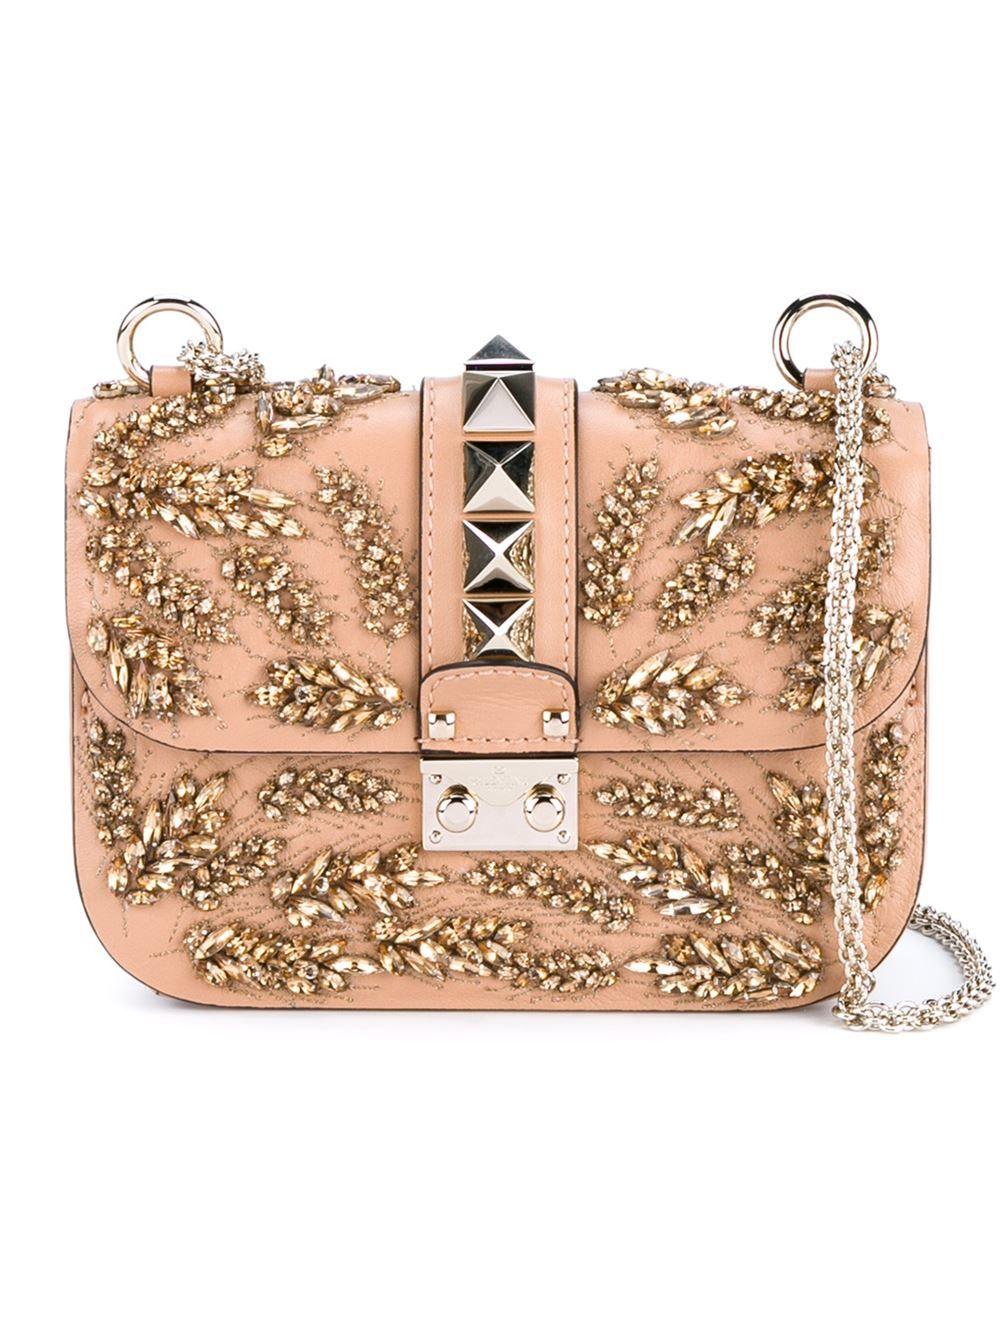 Valentino Garavani The Rockstud Small Leather Shoulder Bag - Blush Valentino xn1JzH5